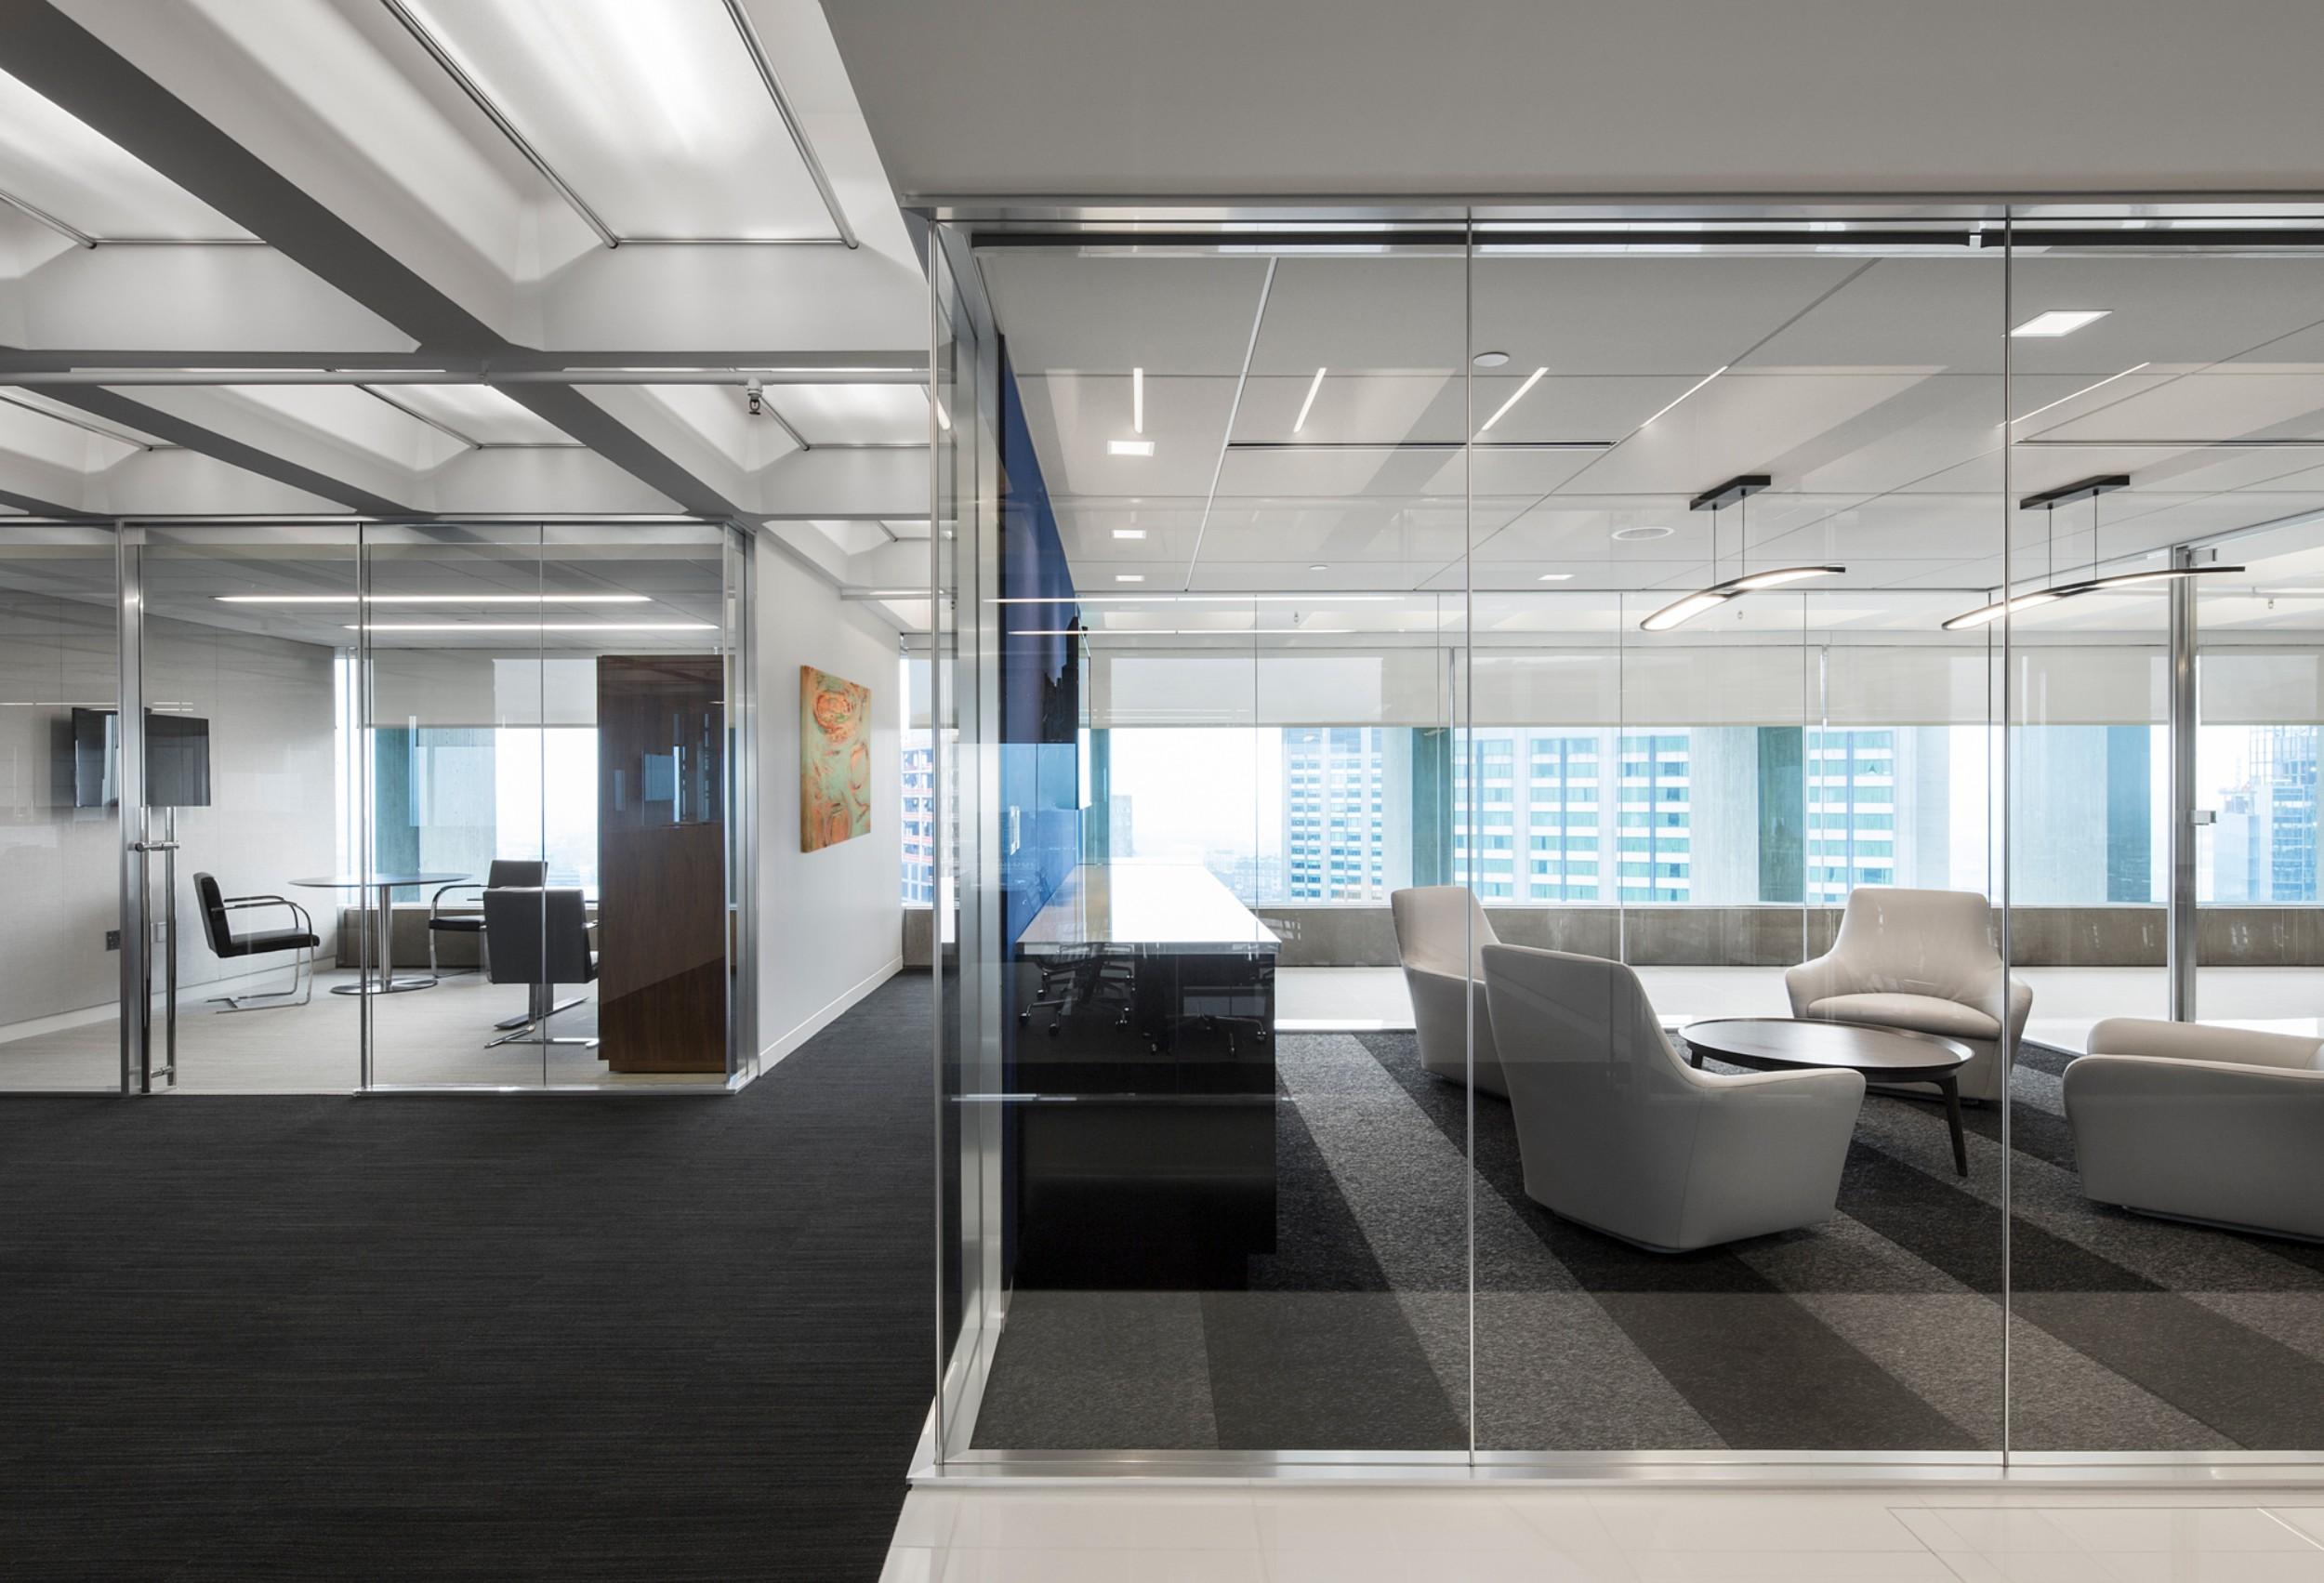 Kensington_Capital_Ventures_Holdings_Corderman_Construction_Office_Finance_Boston_Interior_Offices.jpg